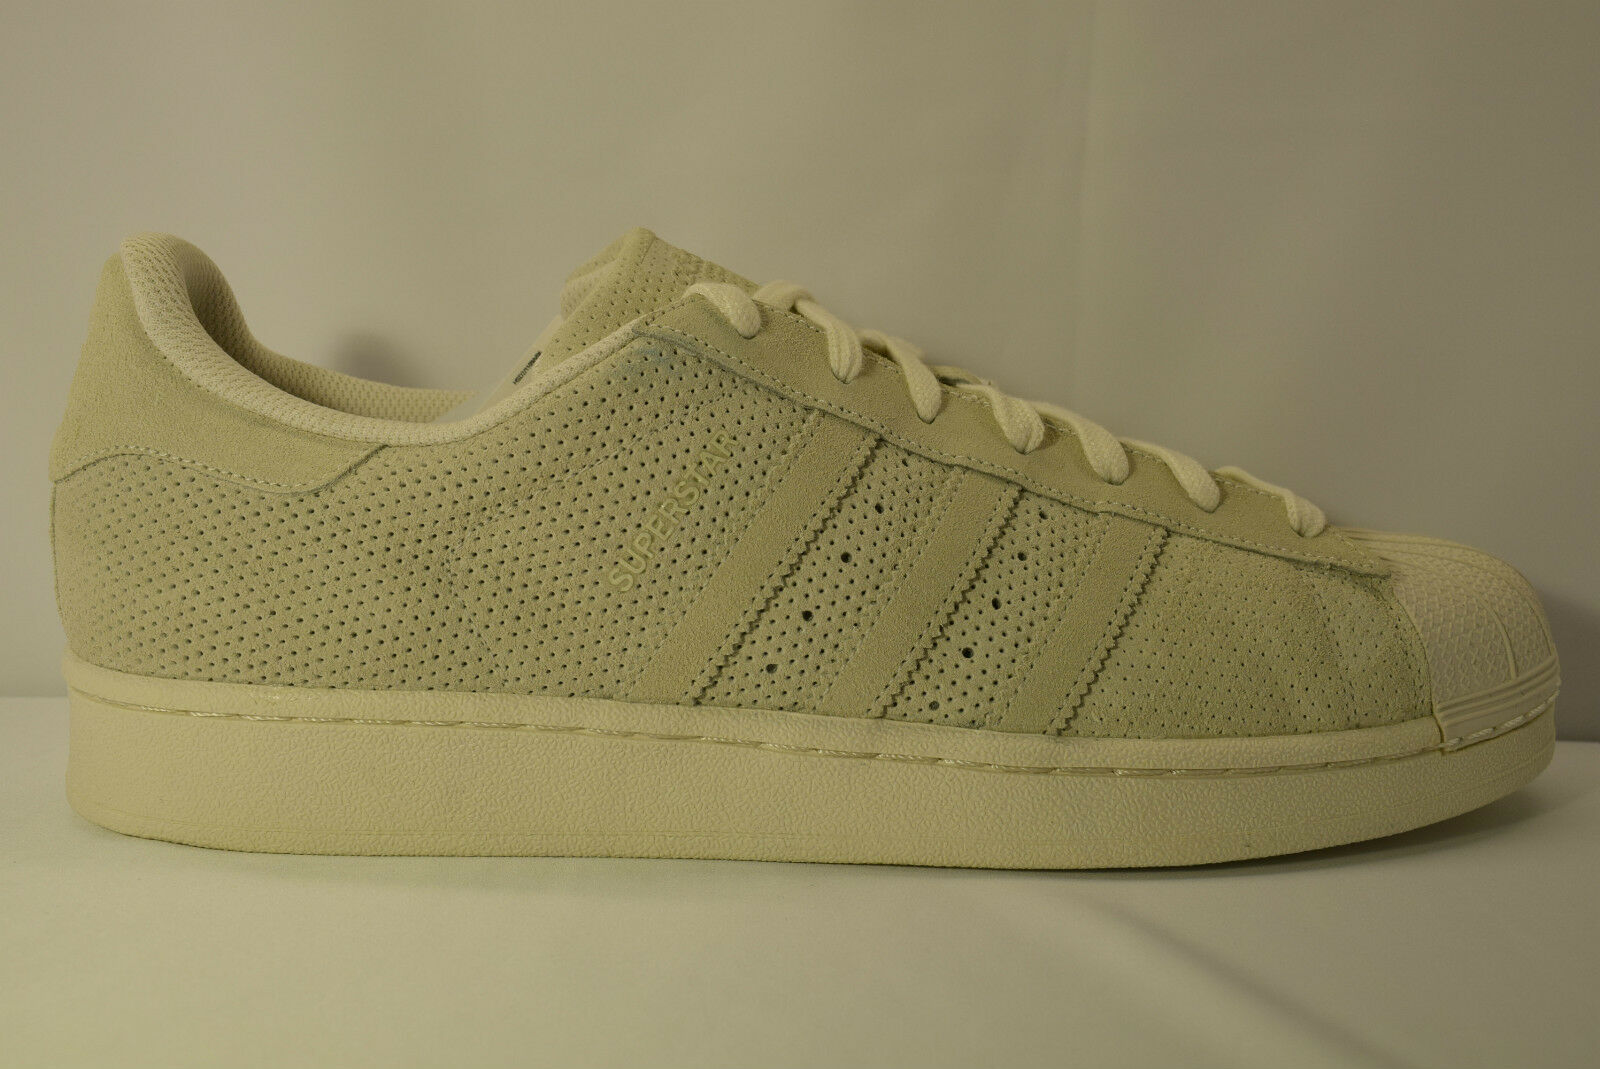 Adidas Superstar RT s79477 samba Superstar stansmith zapatos caballero